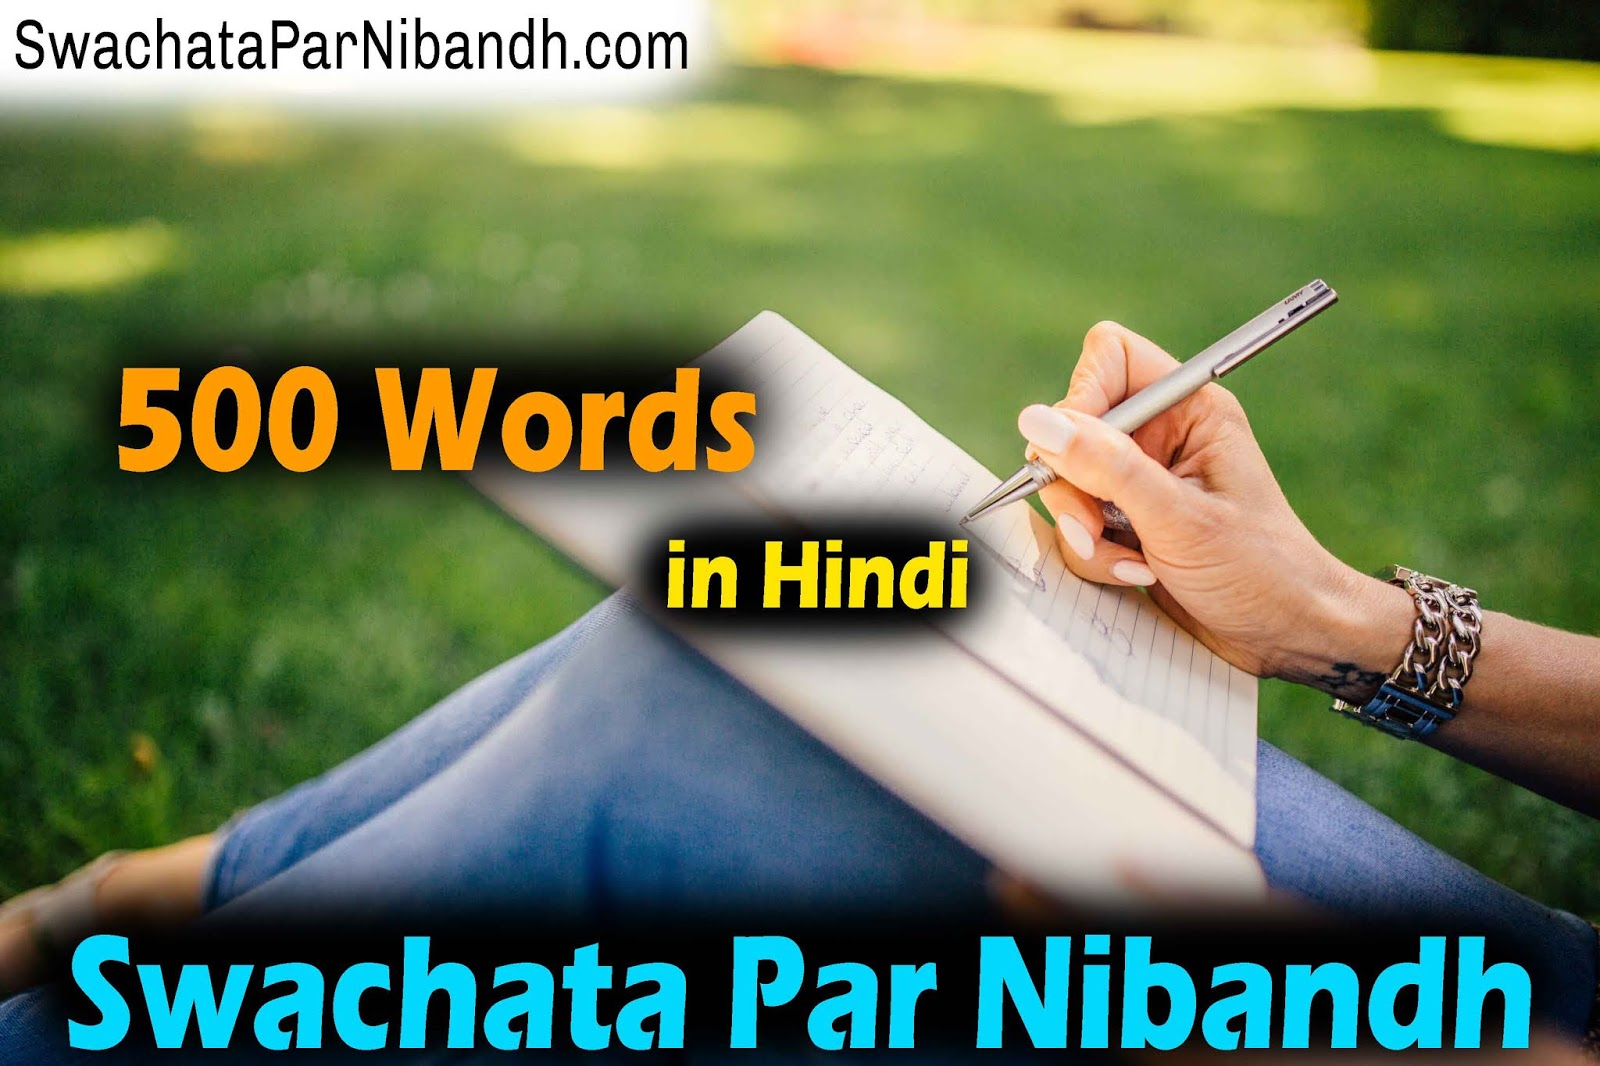 Swachata Ke Upar Nibandh | Swachata Par Nibandh 400 Shabd ka- स्वच्छता पर निबंध 500 शब्दों में